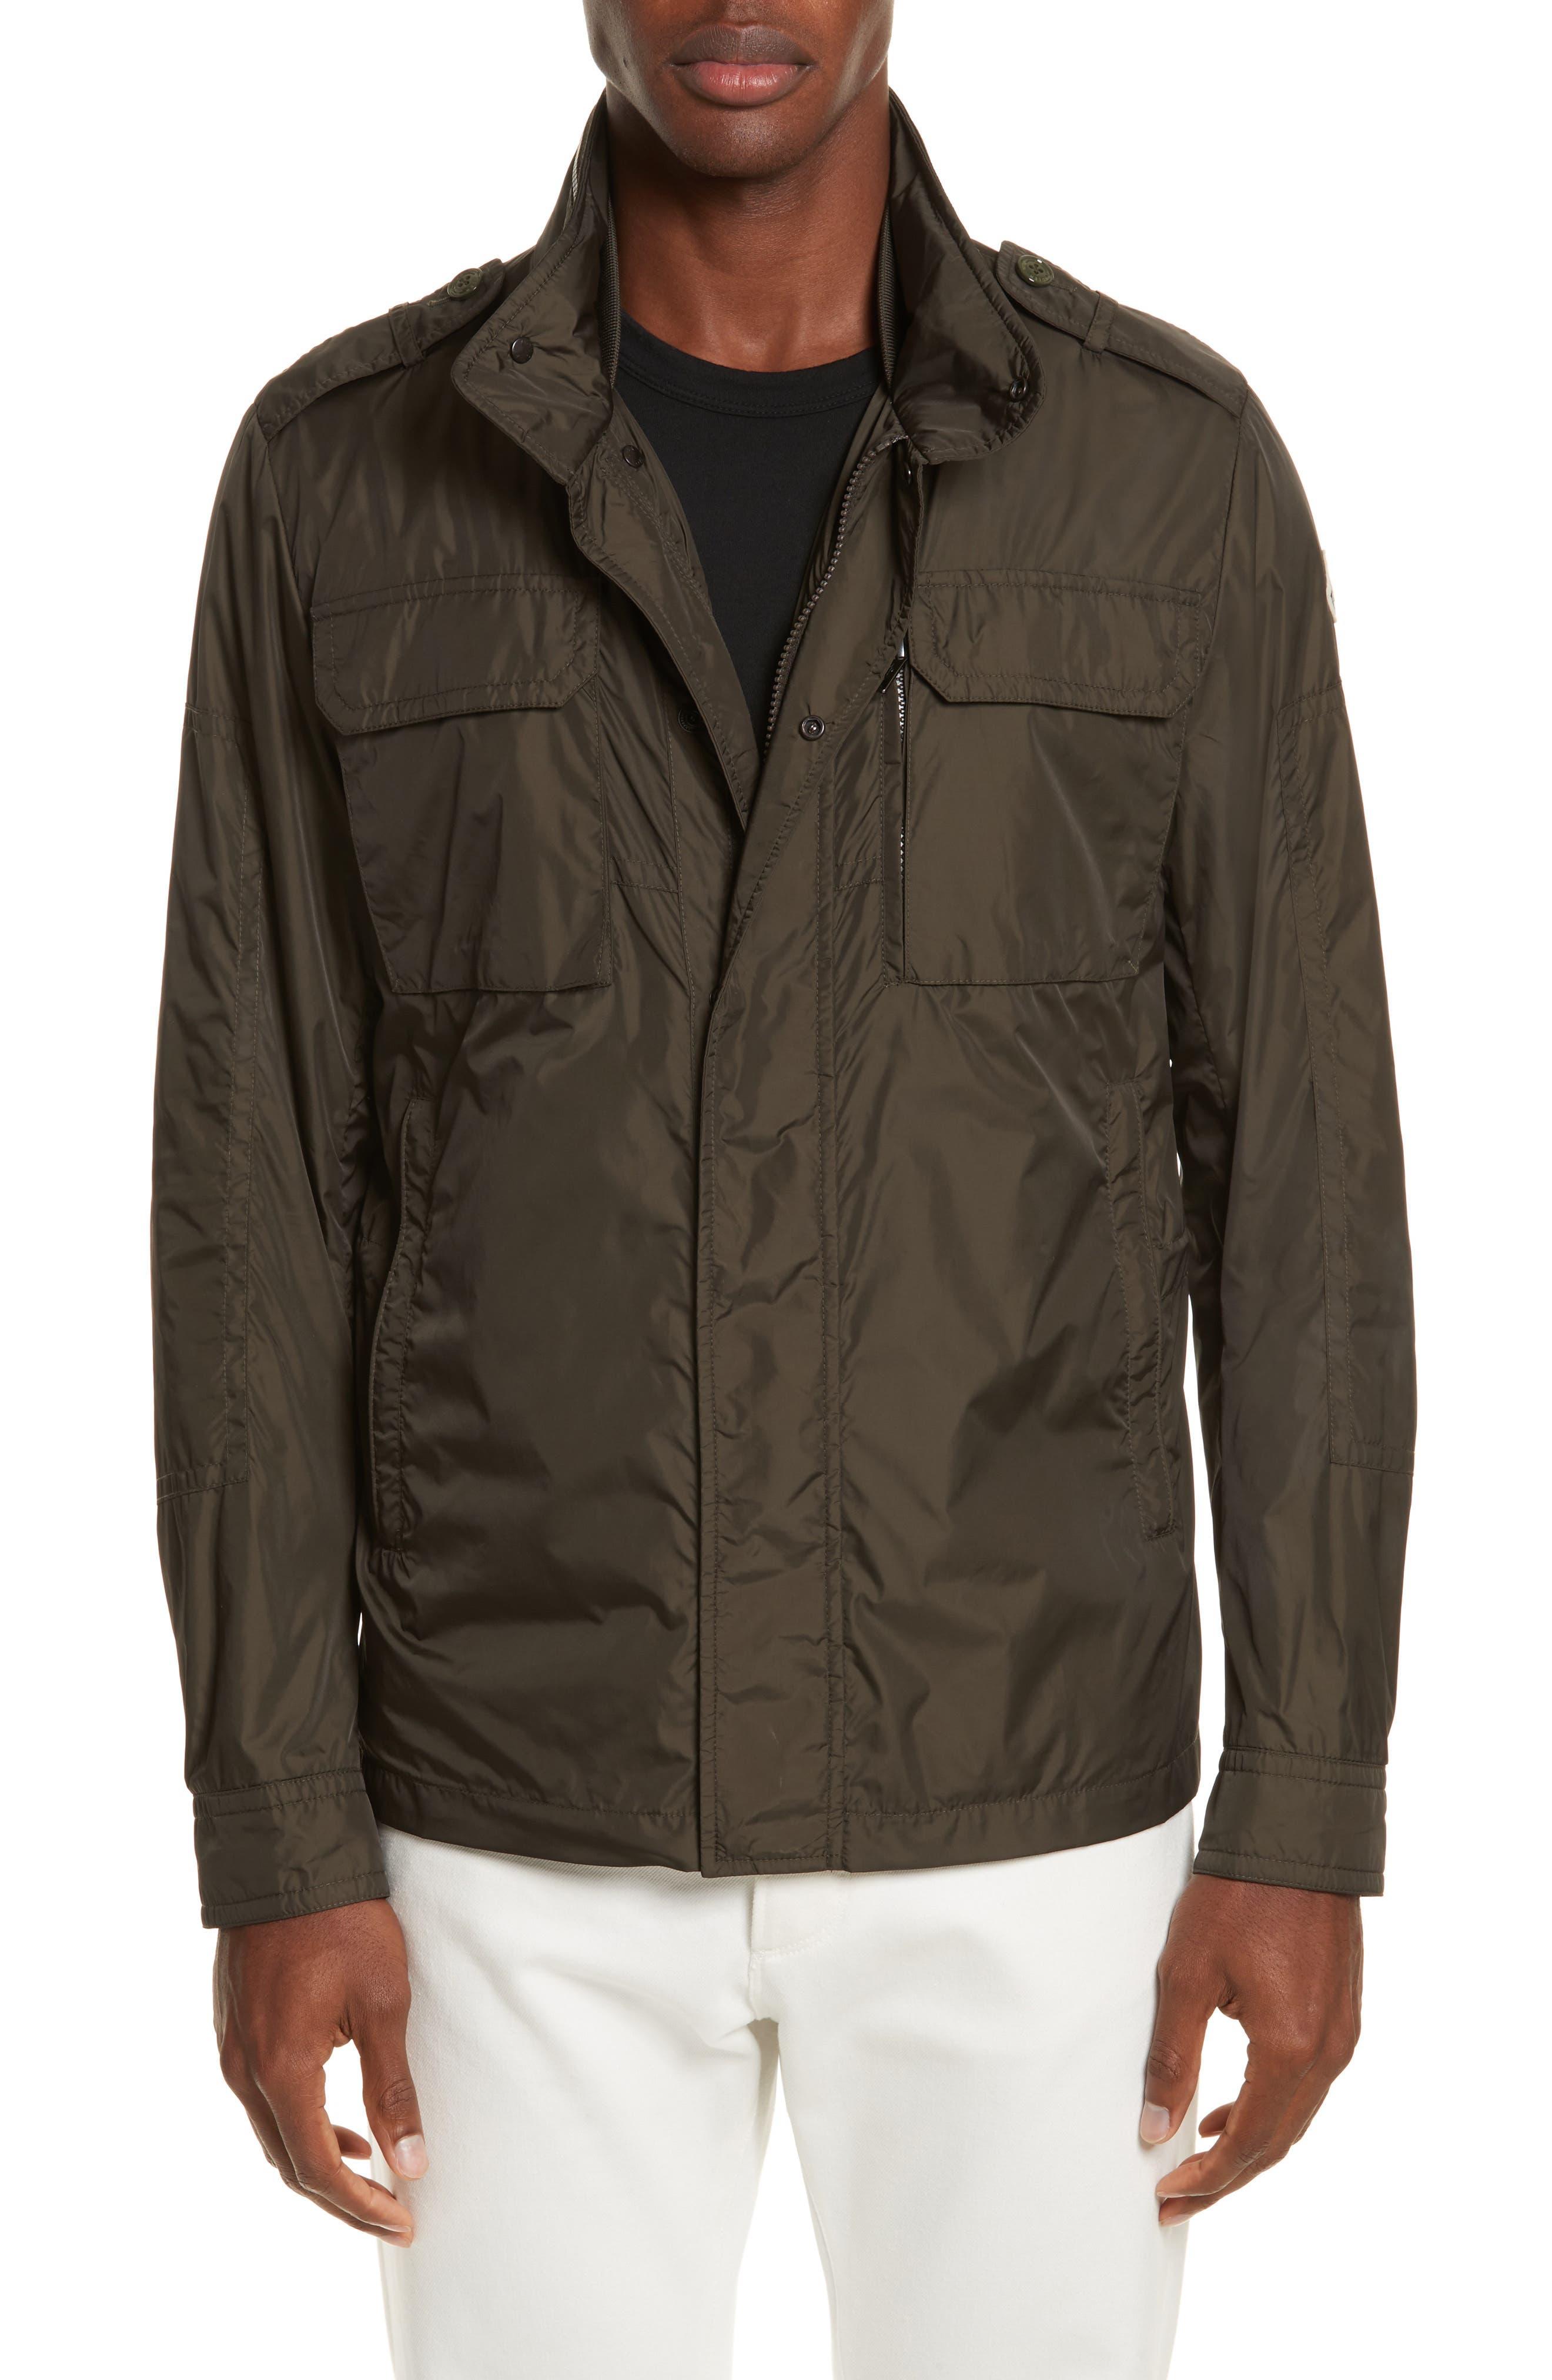 Jonathan Field Jacket,                         Main,                         color, 340